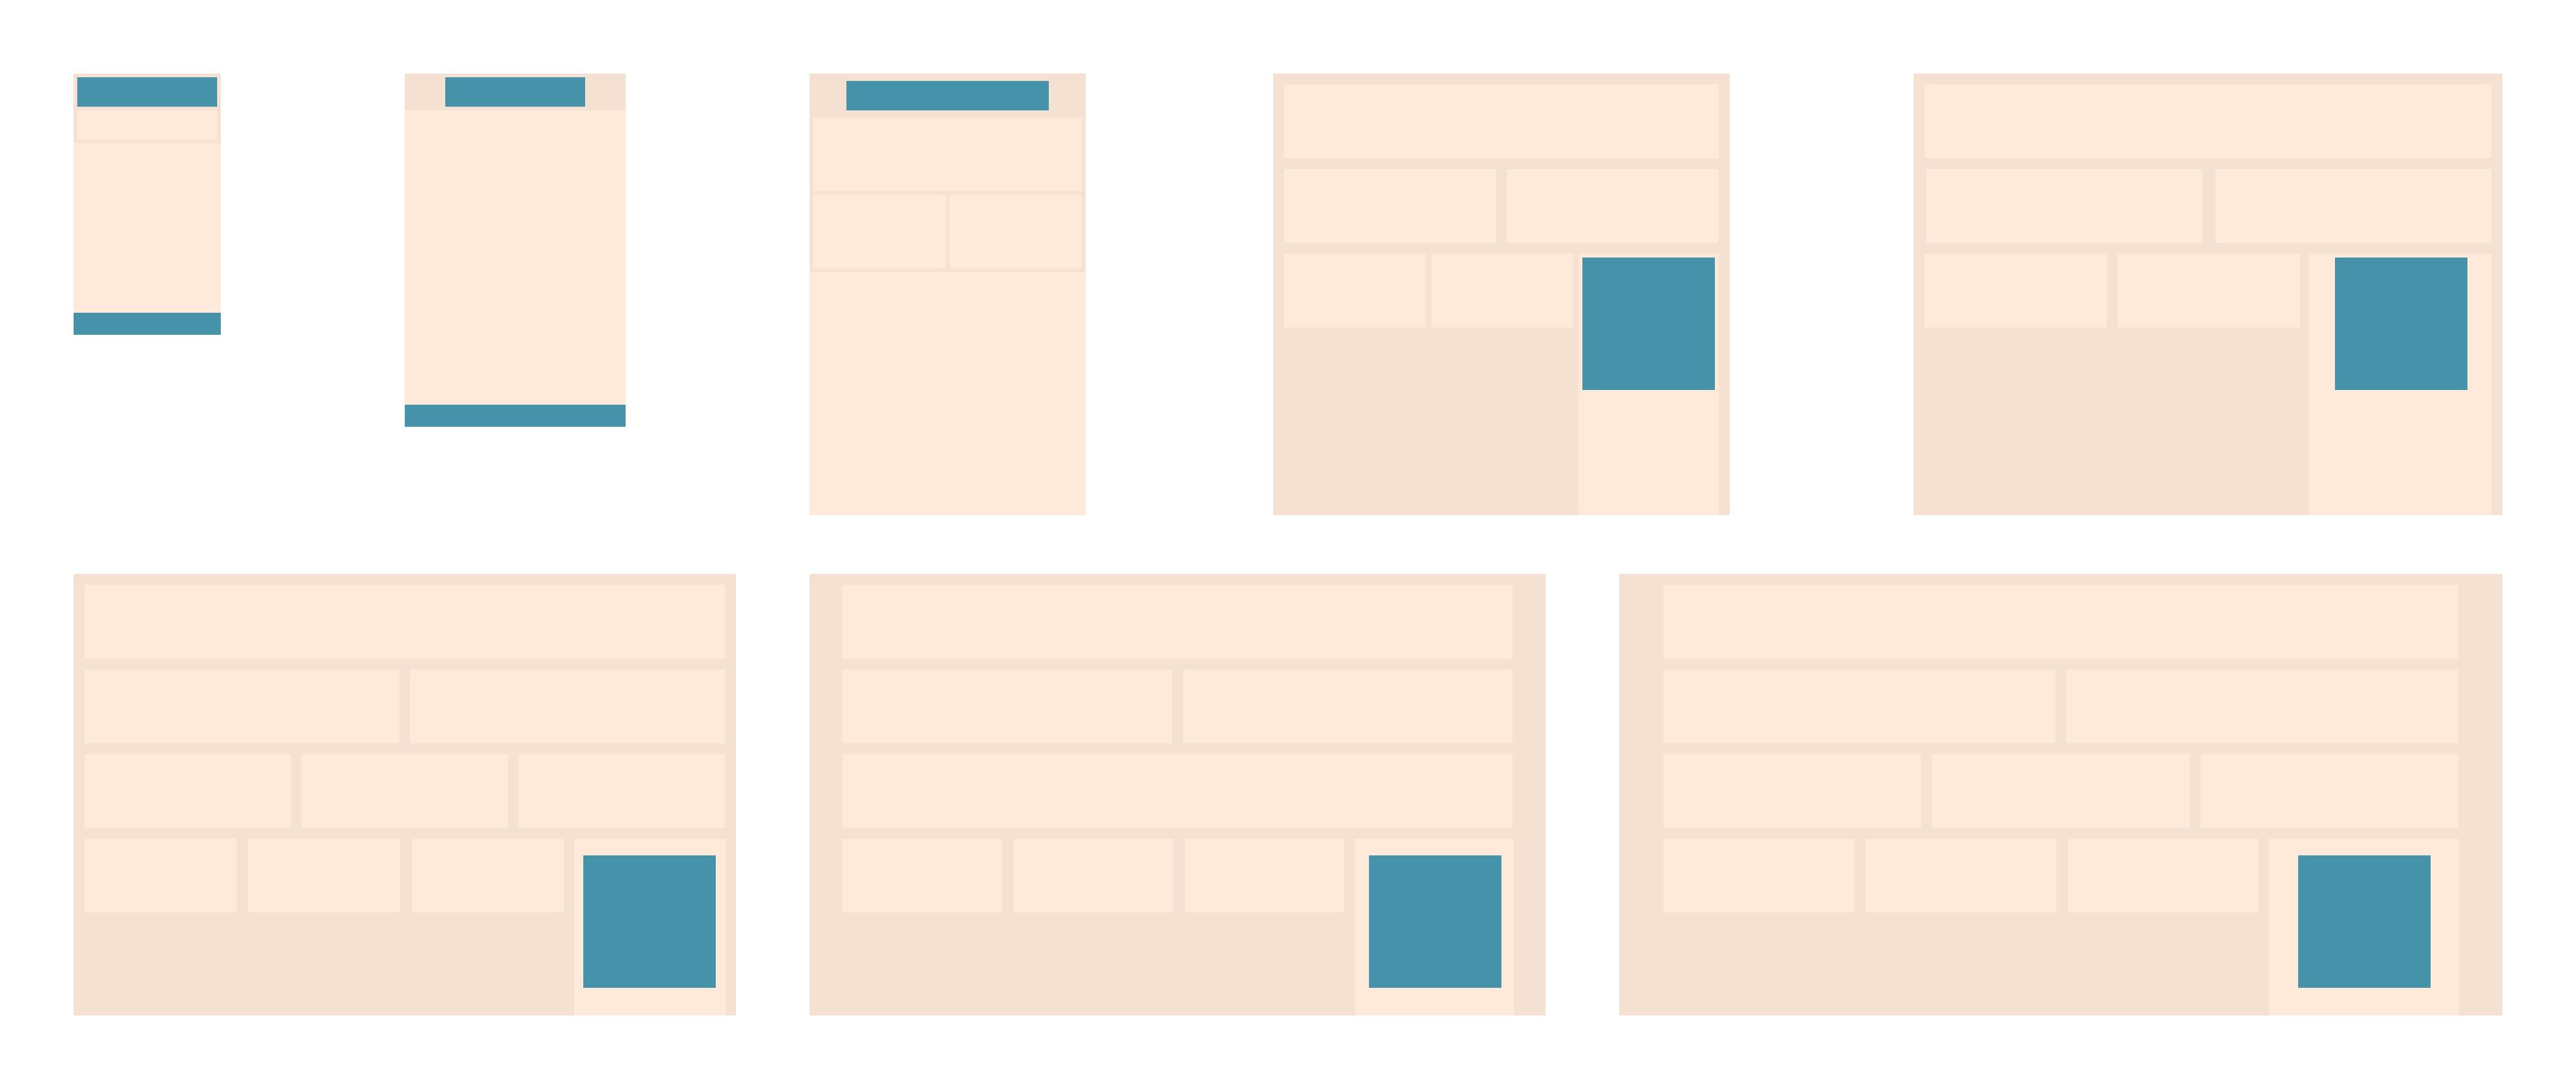 FD 2 - Custom Grid